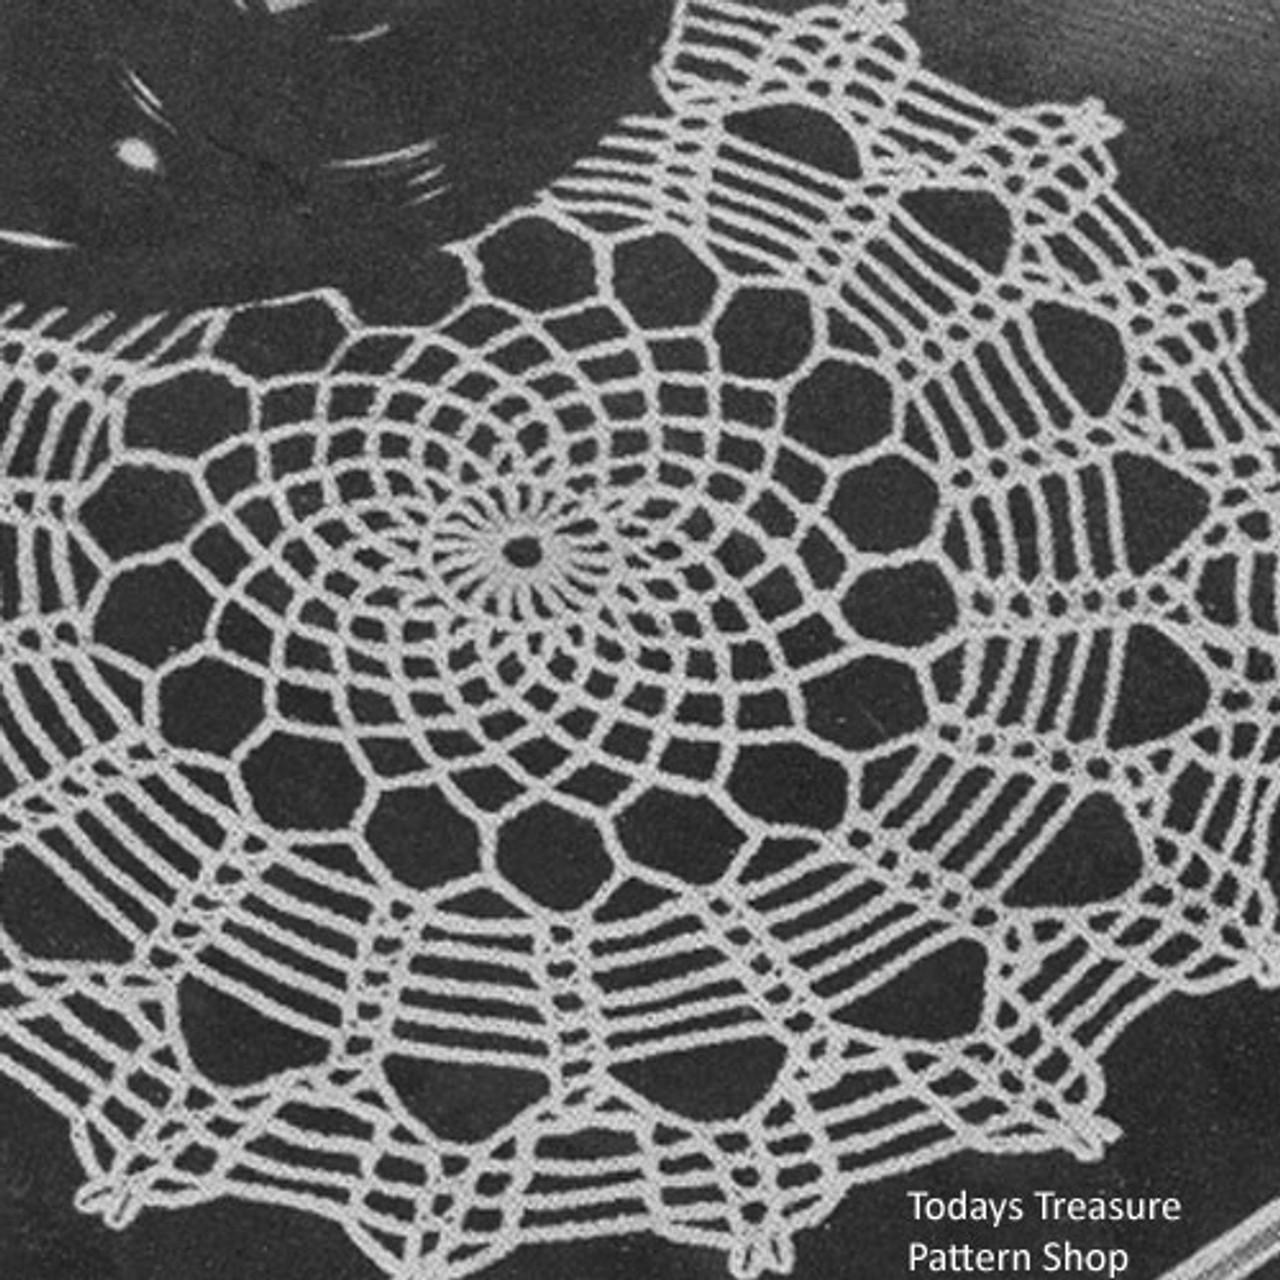 Classic Spiderweb Crochet Doily Pattern